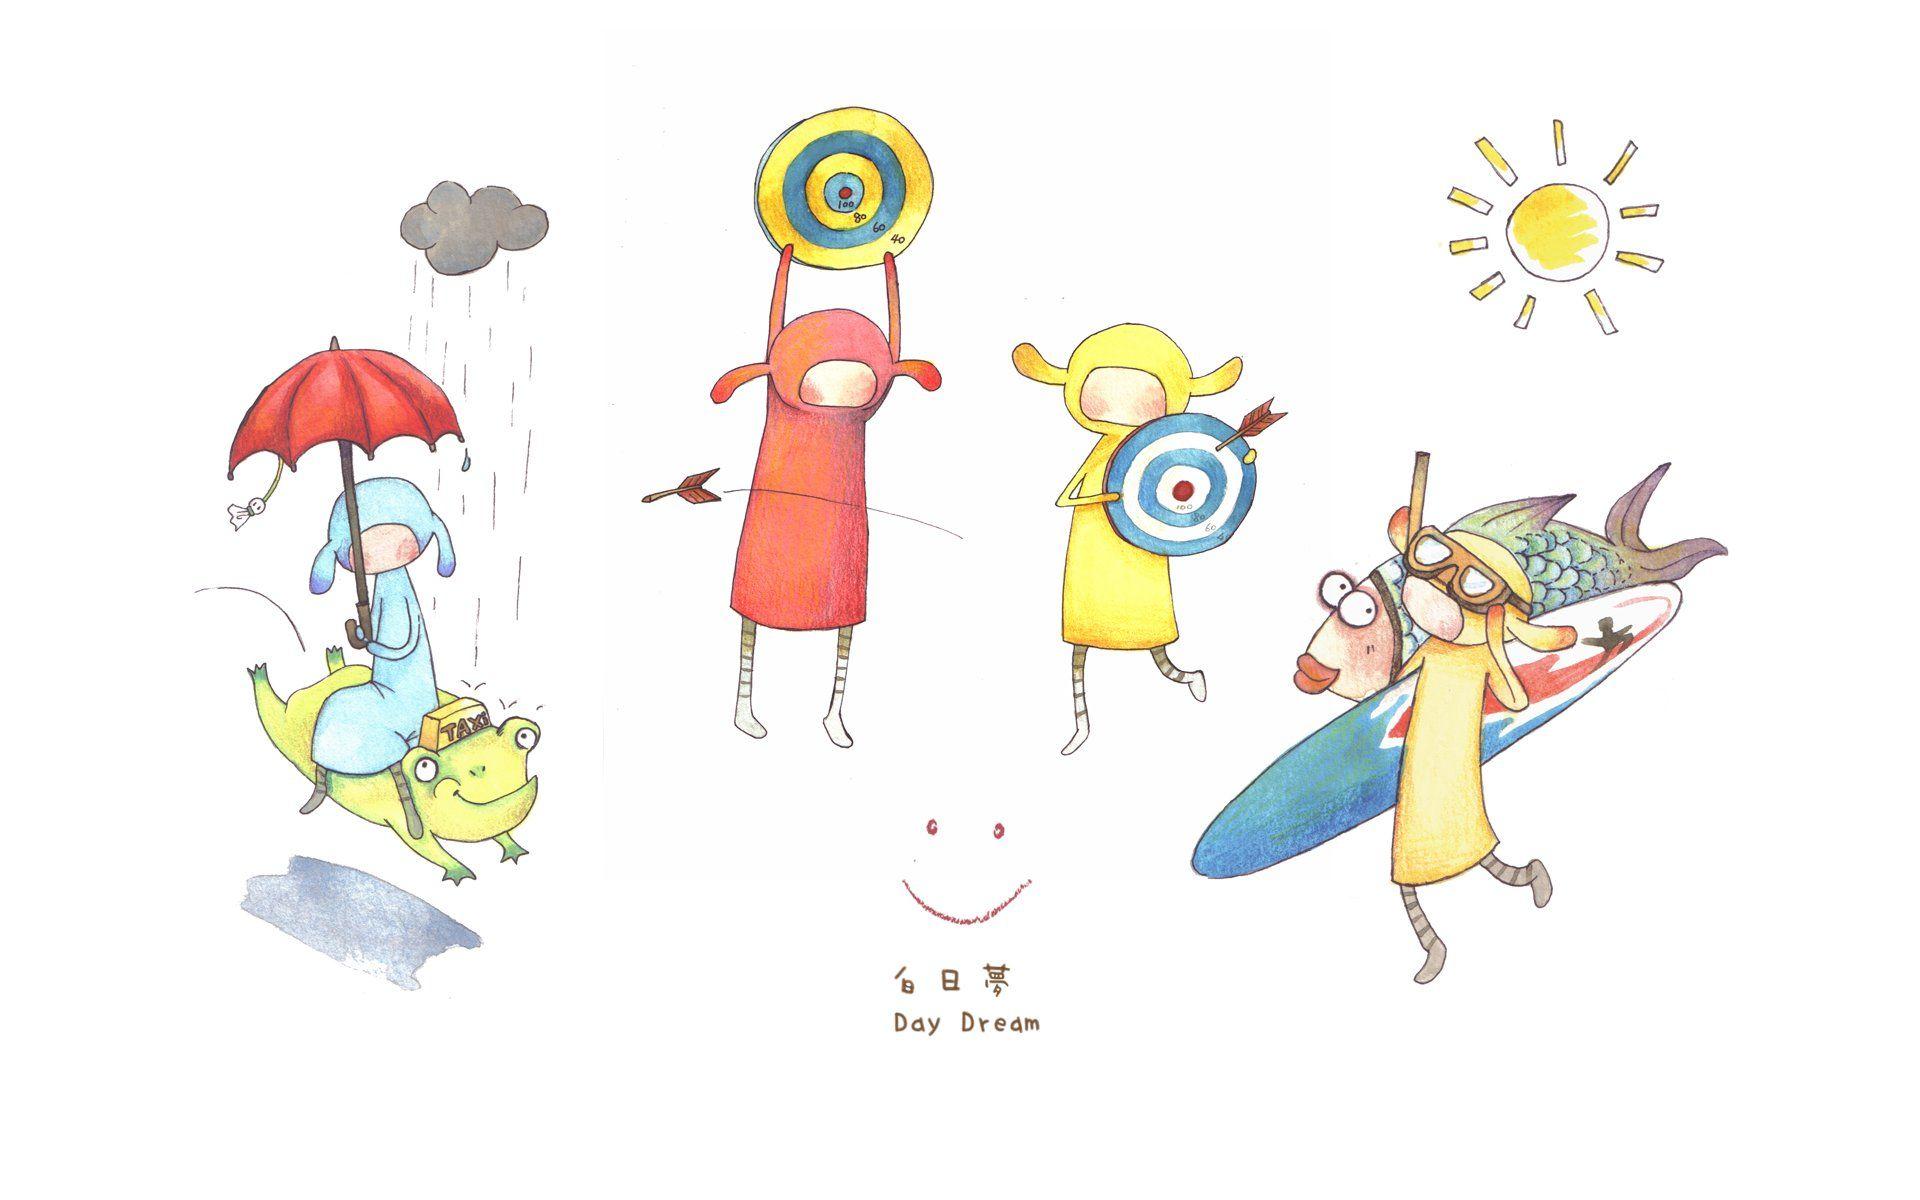 台湾插画家黄匀弦插画壁纸 白日梦 Character Wallpaper Cartoon